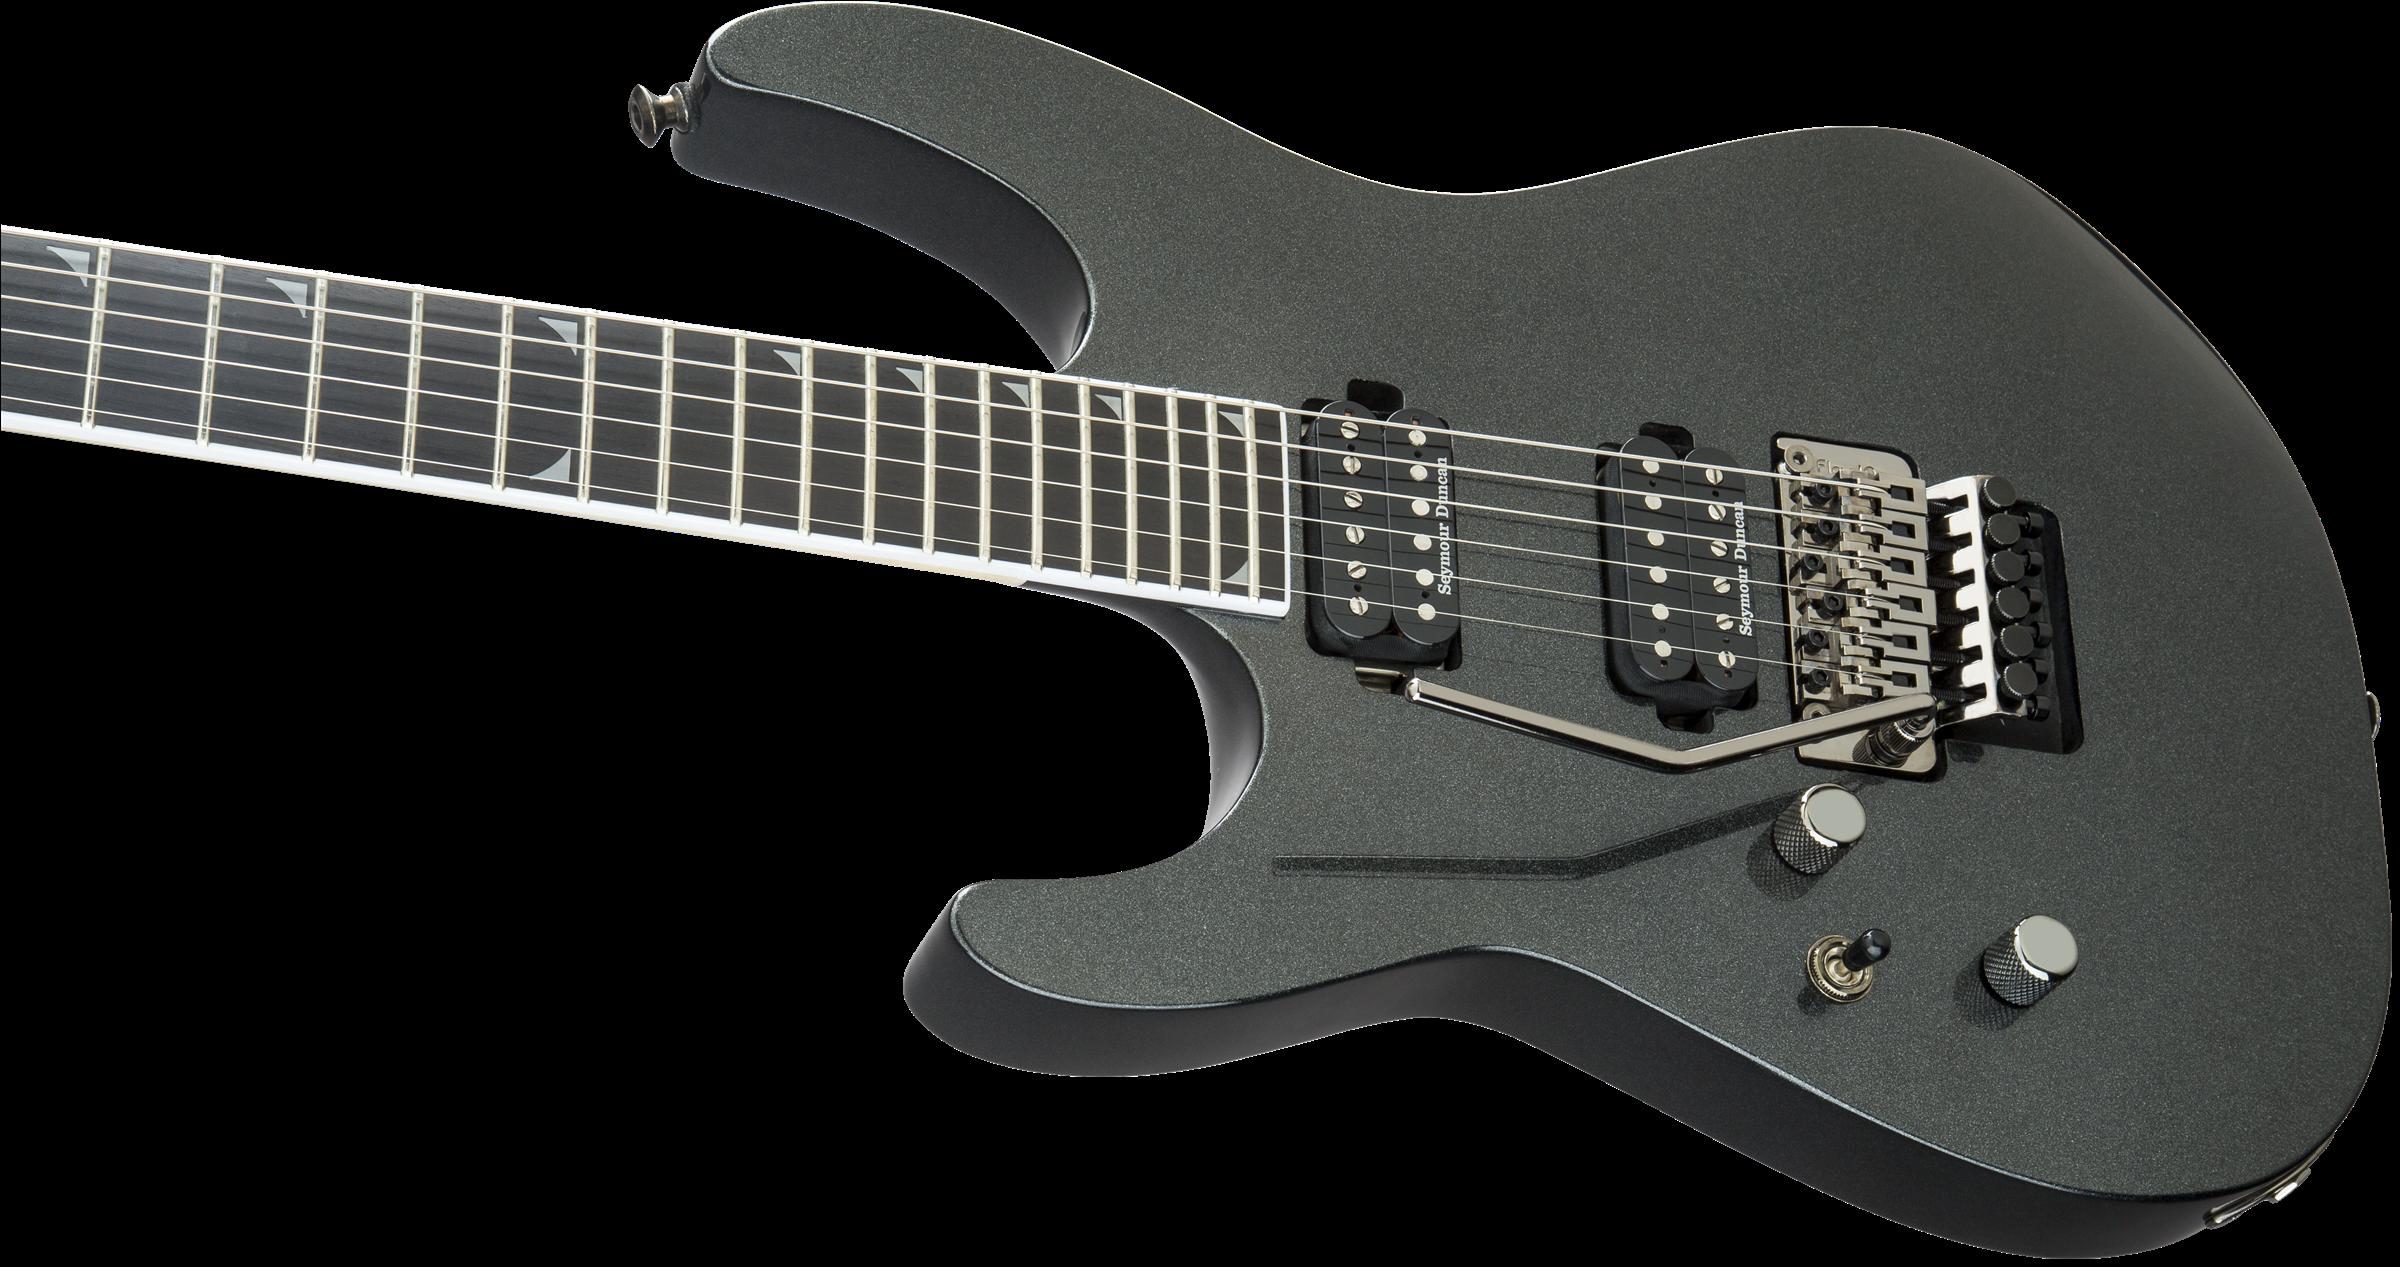 jackson left handed guitar guitar collection ideas